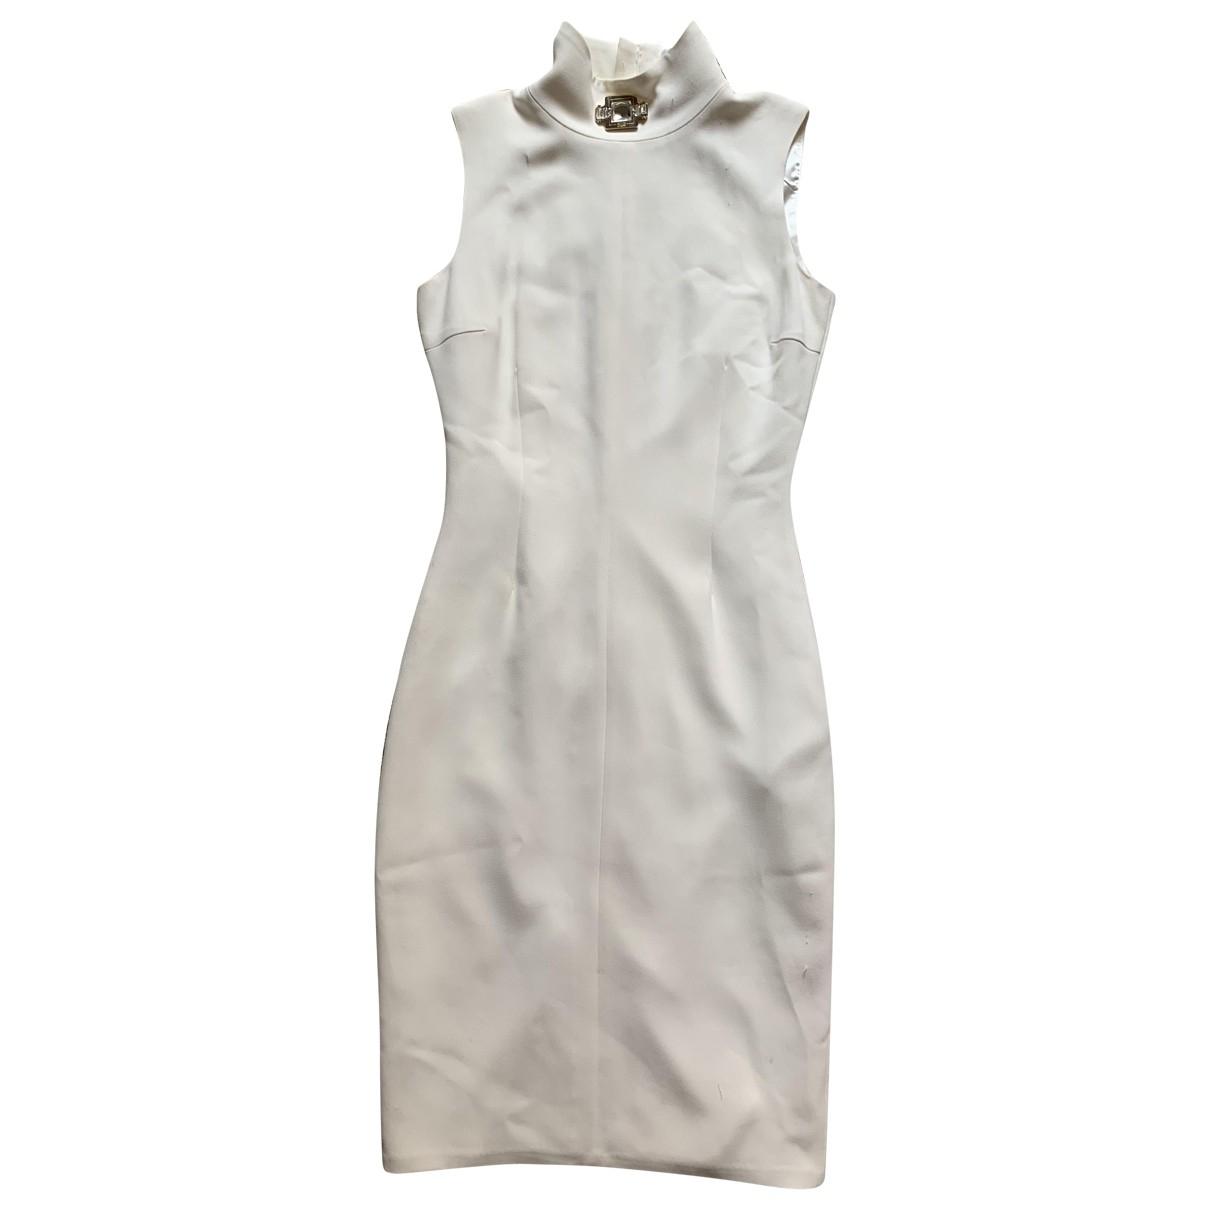 Elisabetta Franchi \N White dress for Women 40 IT